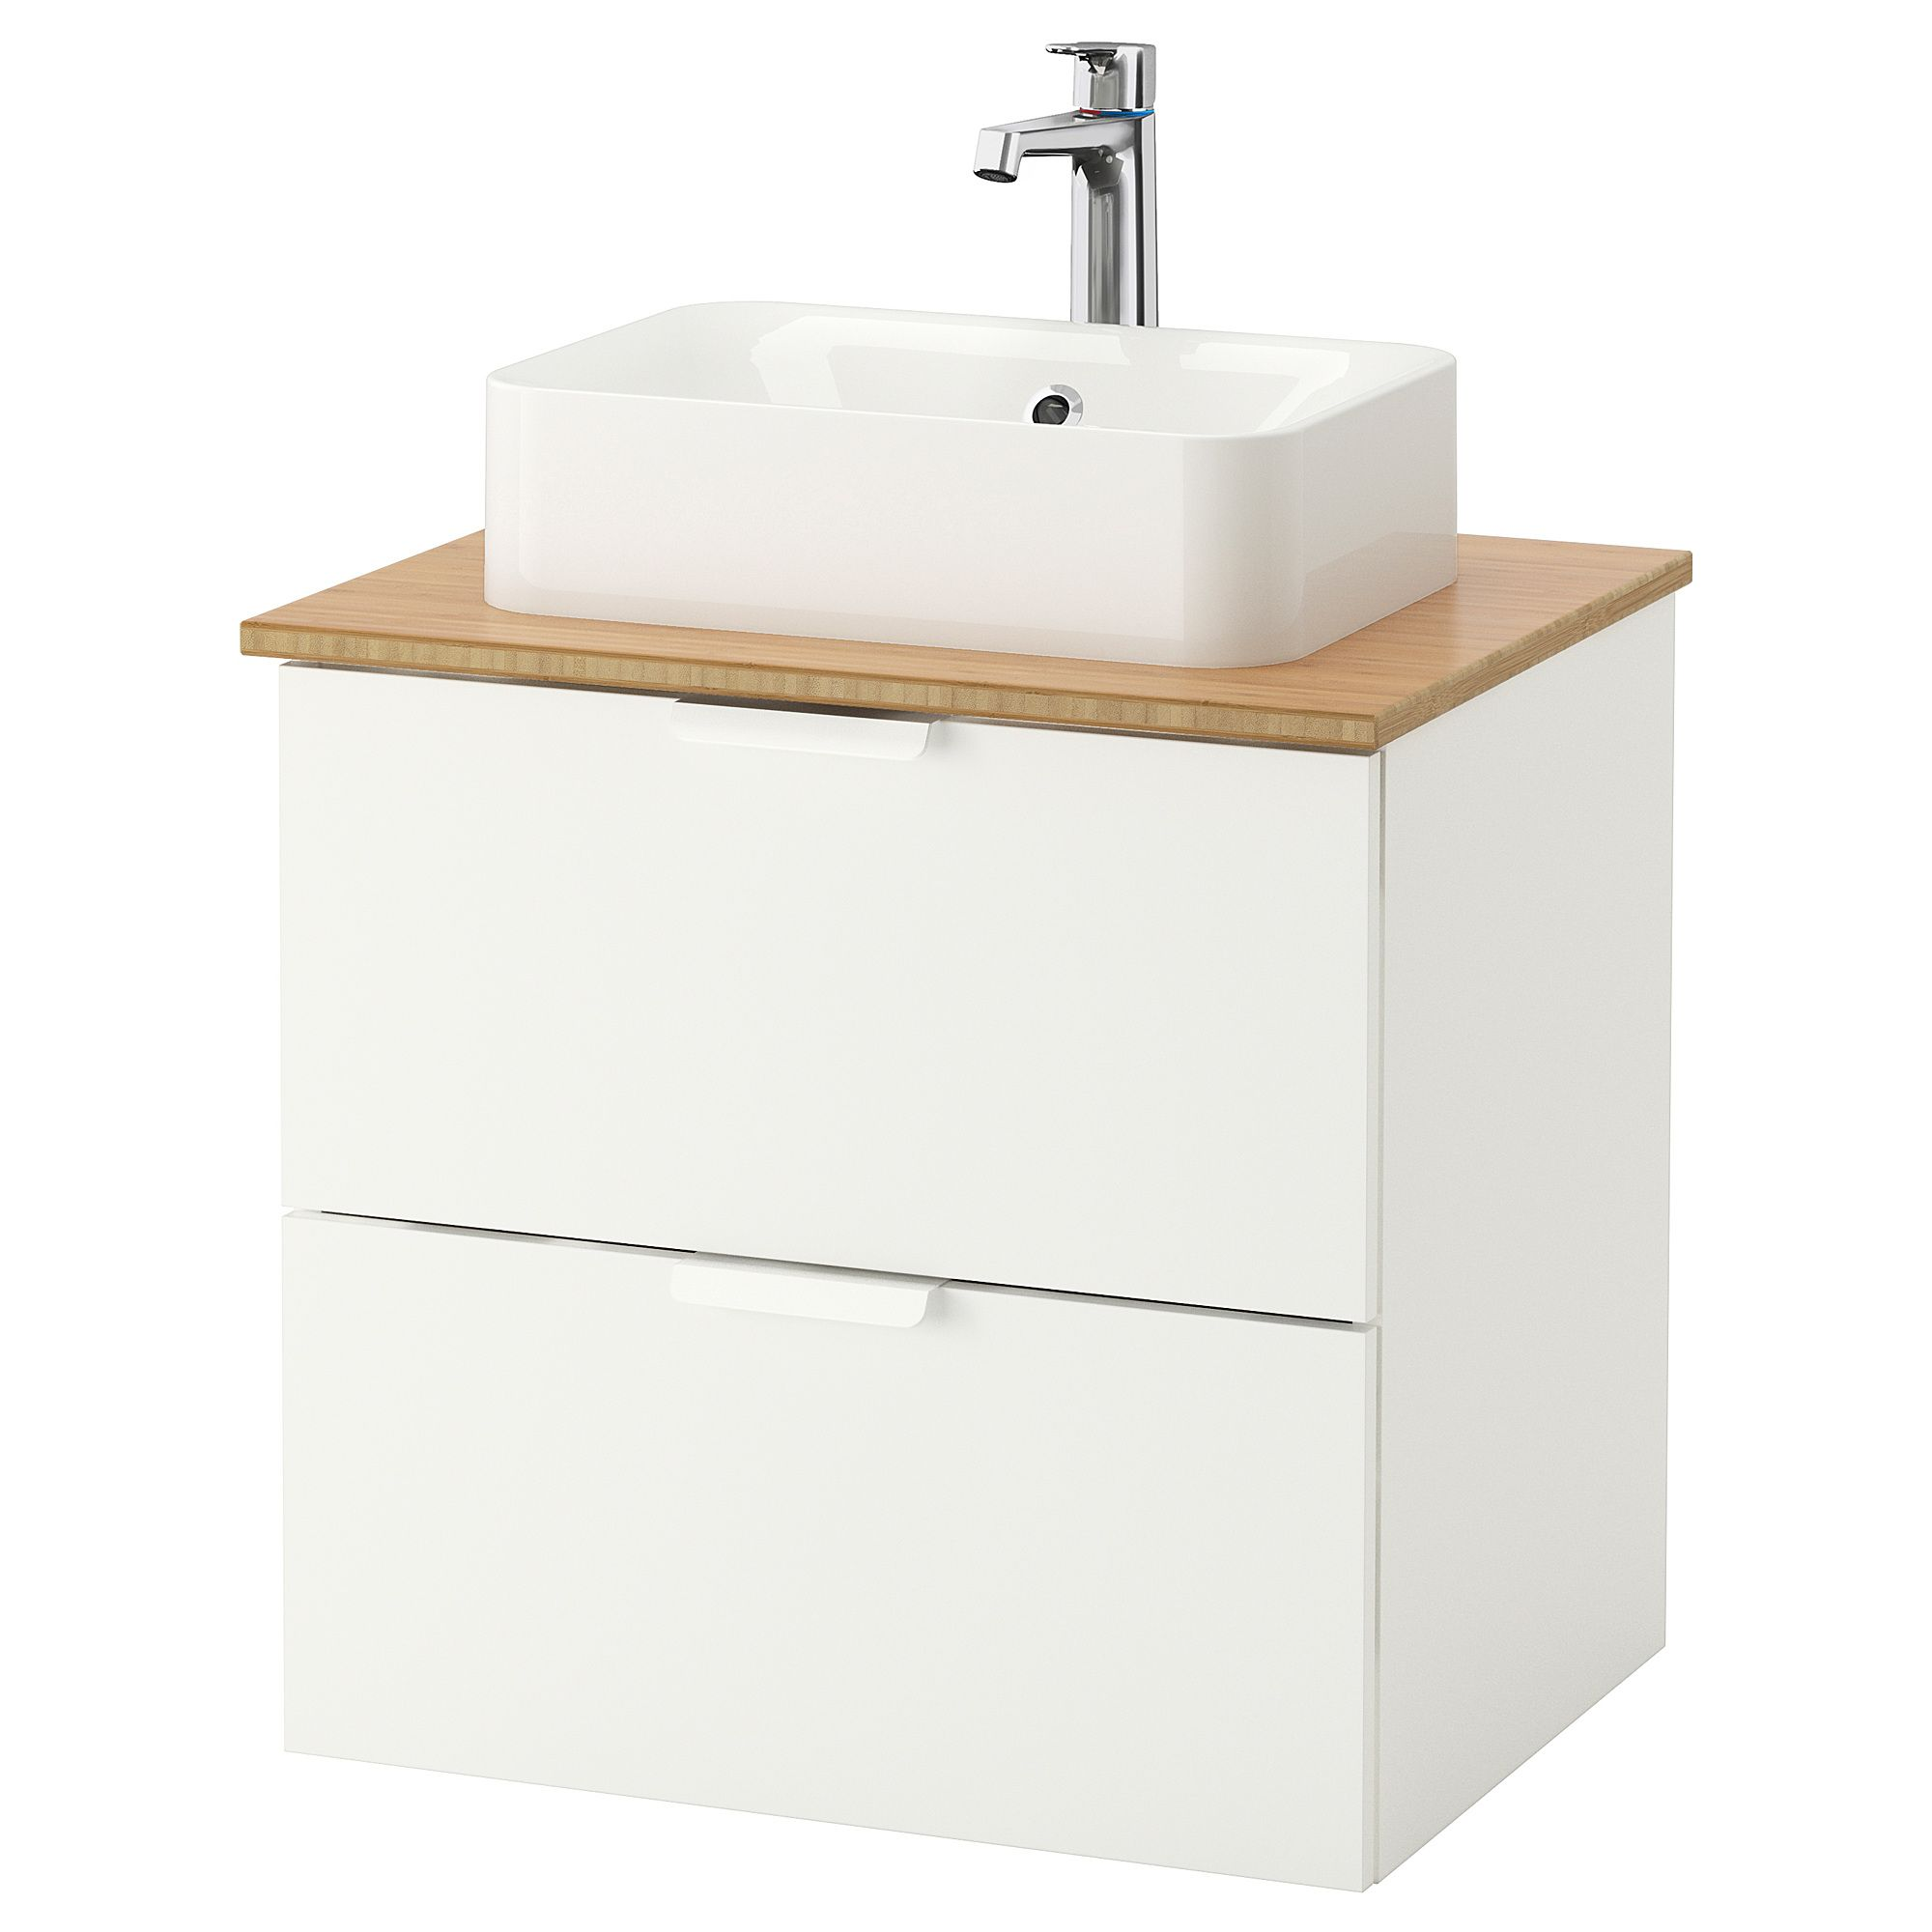 Furniture And Home Furnishings Muebles De Bano Tocador De Bano